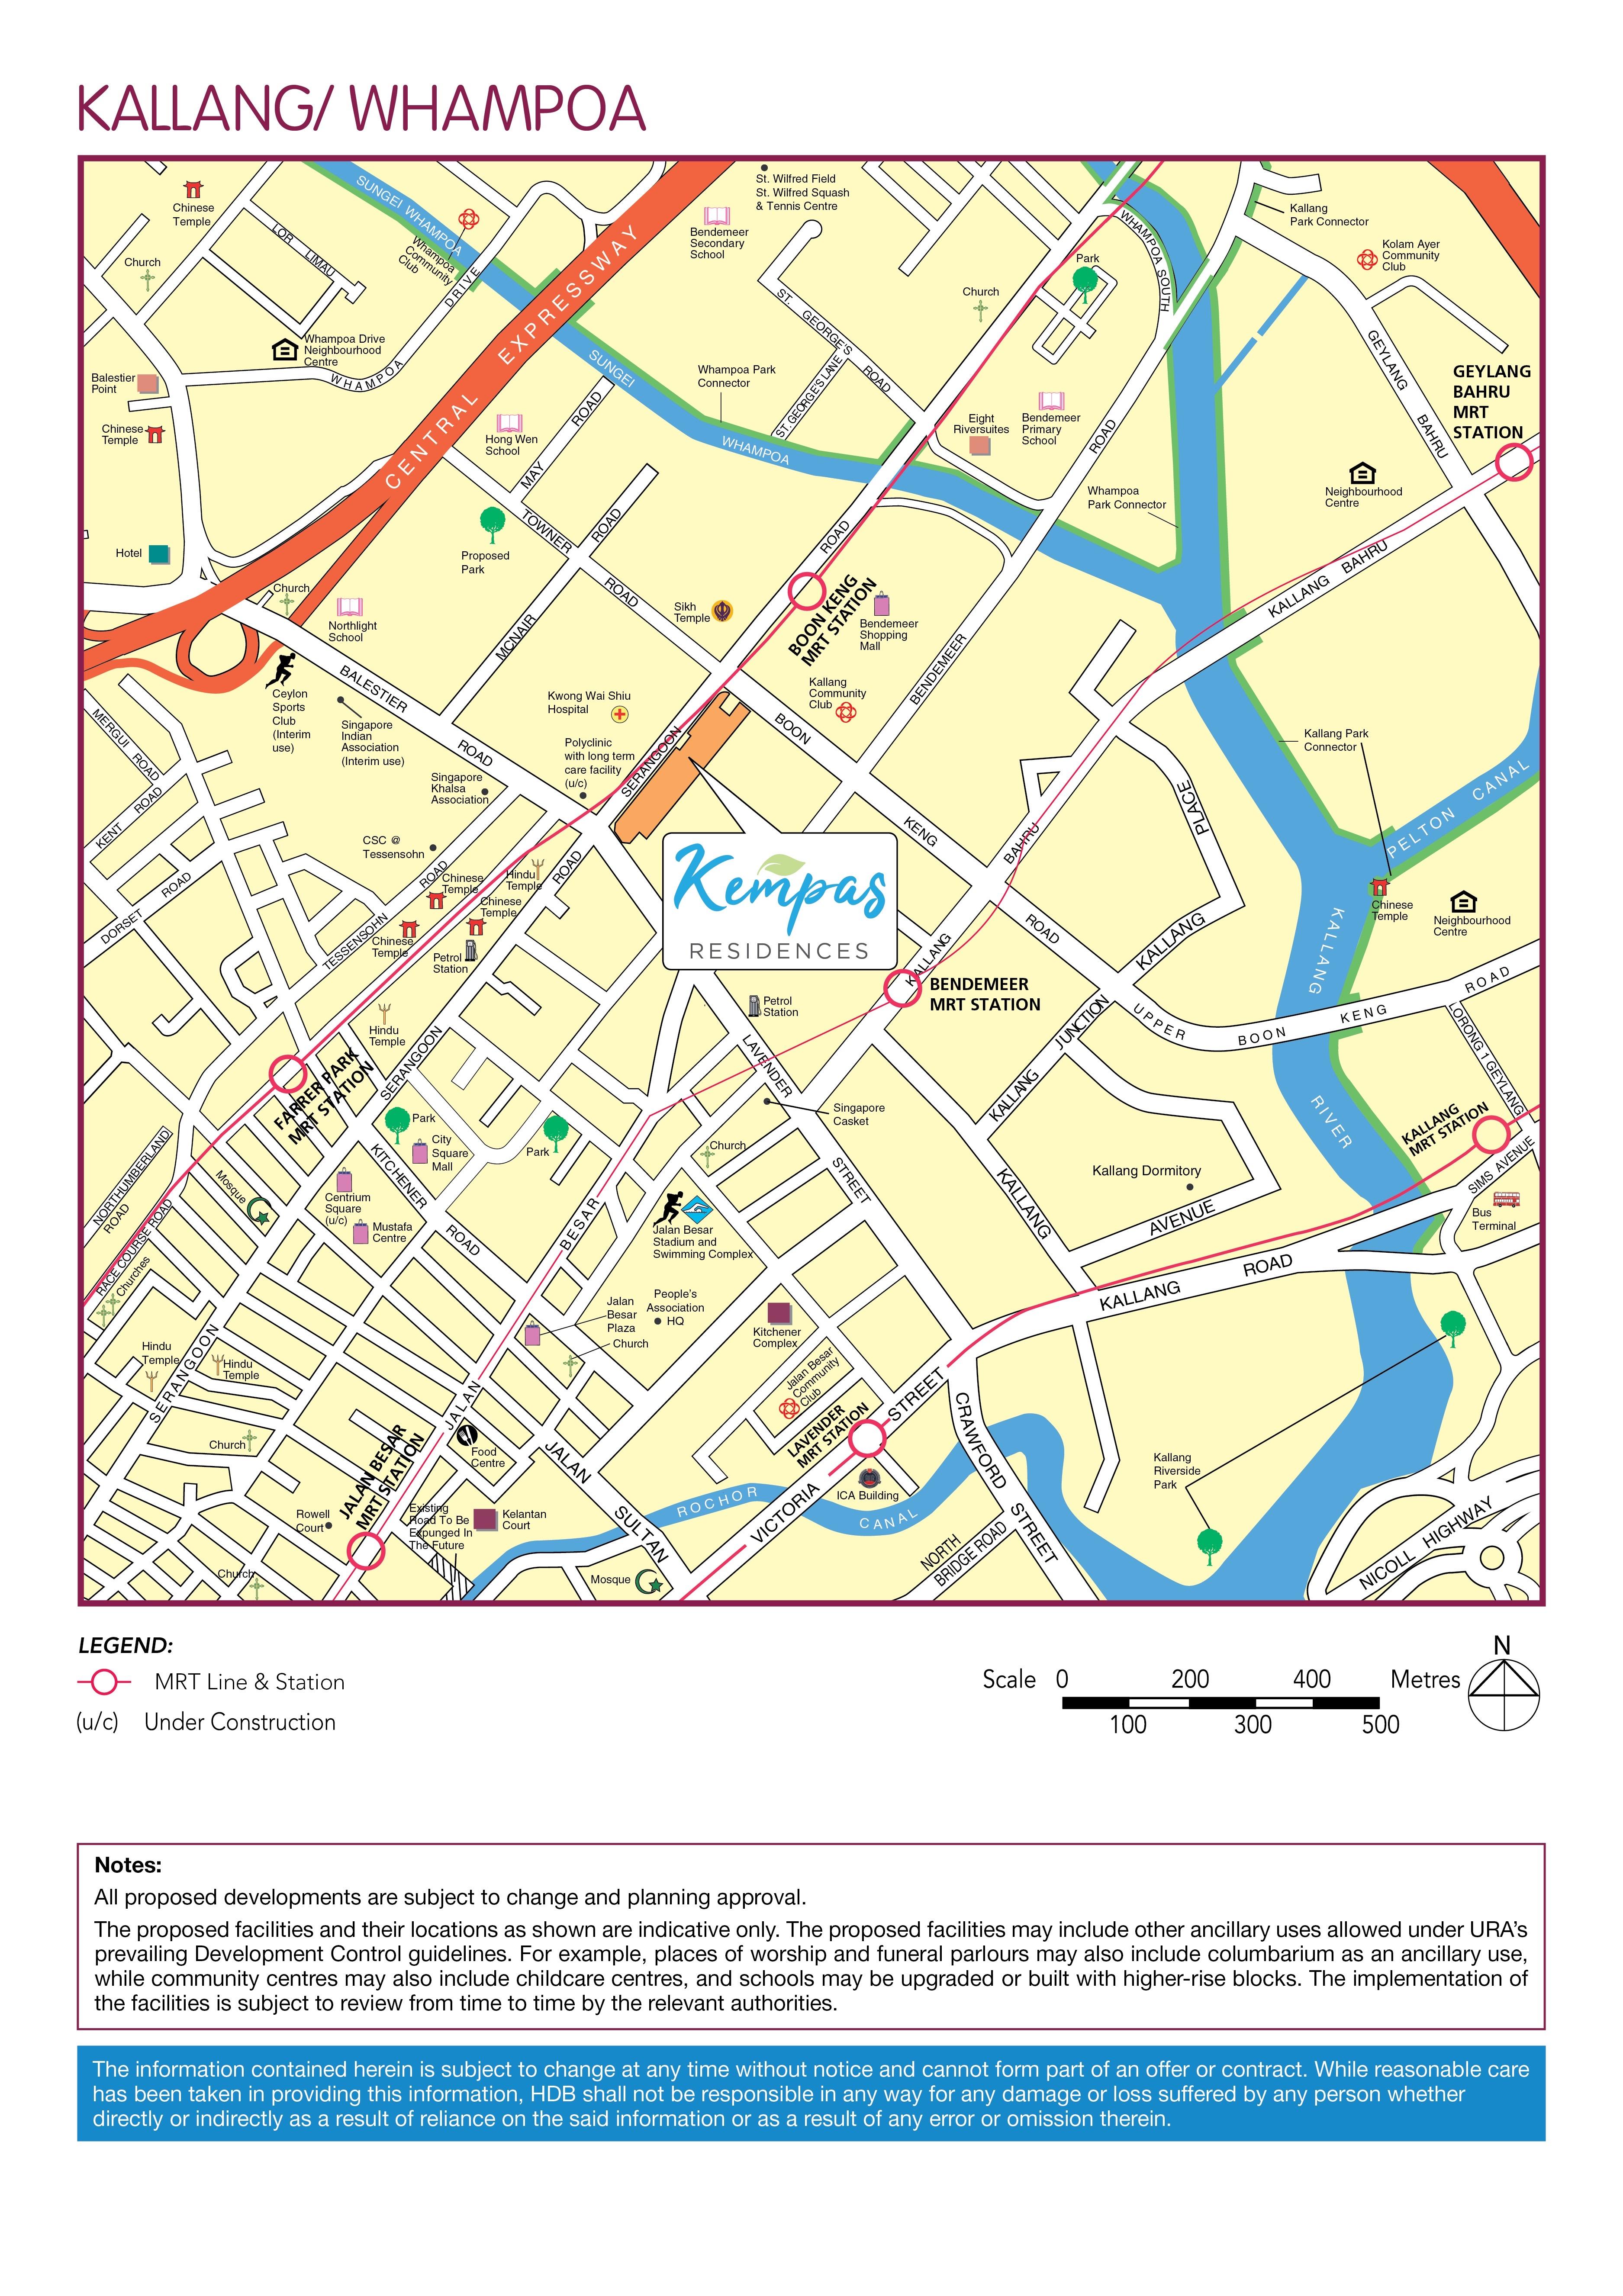 Kempas Residences Location Map